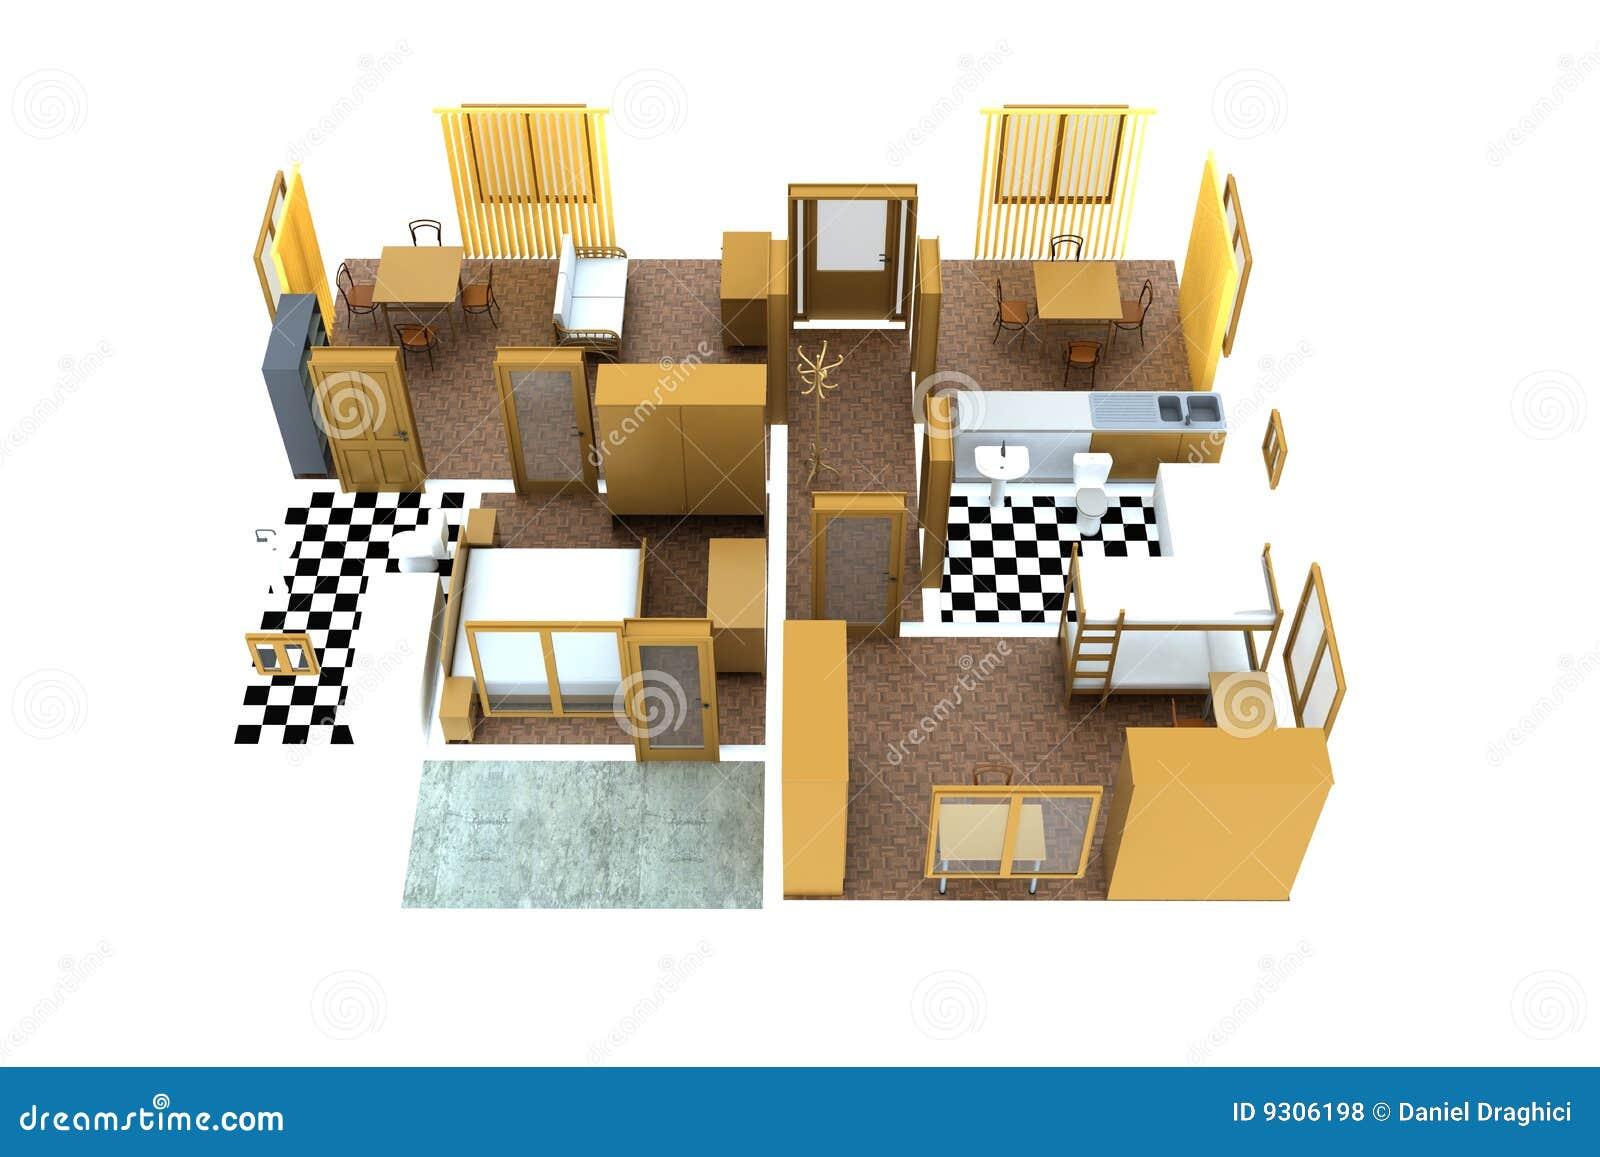 Apartment Royalty Free Stock Photos - Image: 9306198